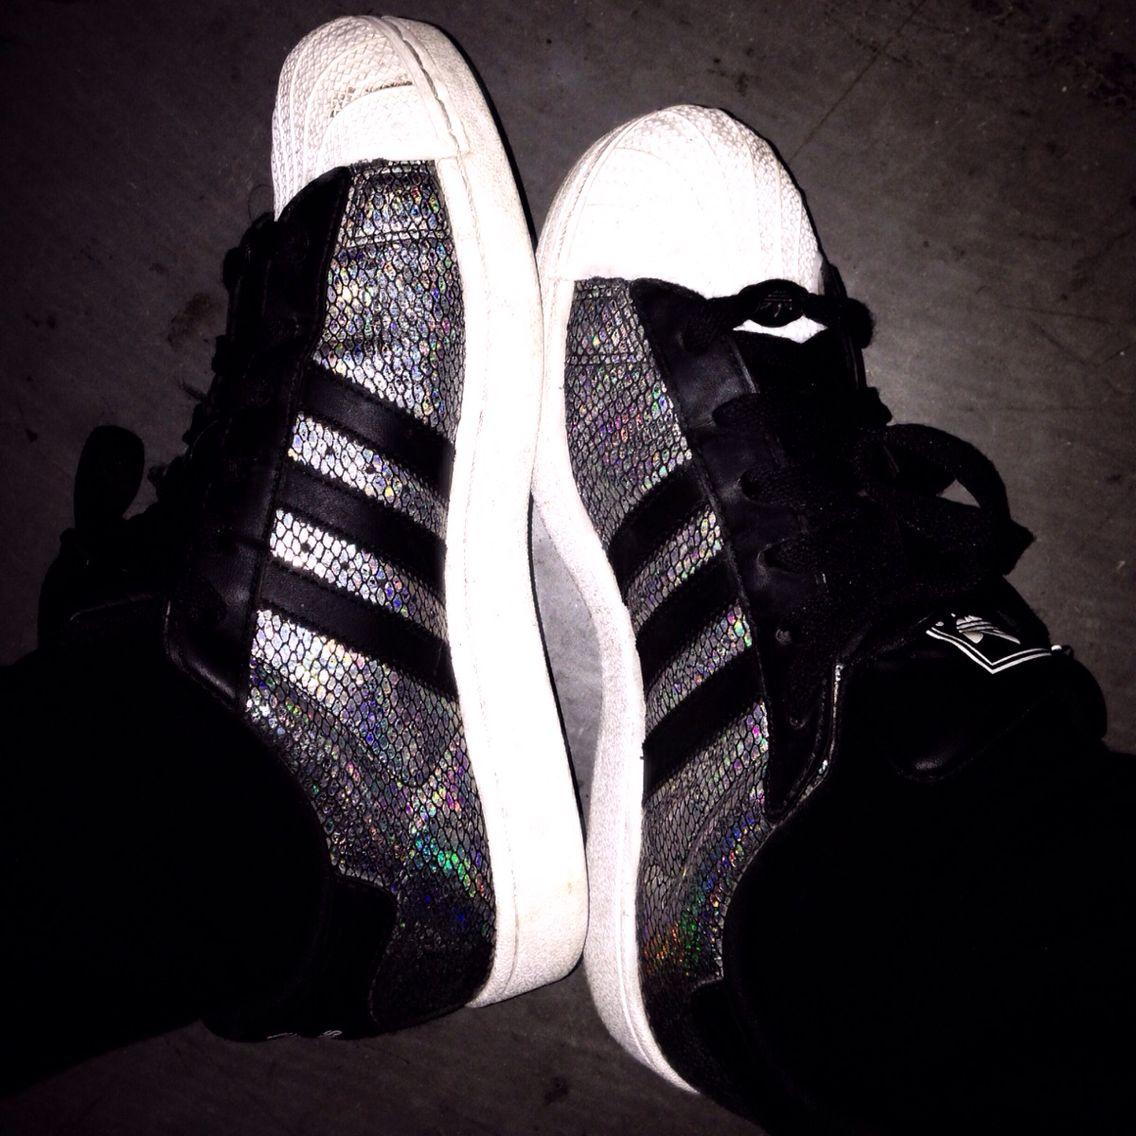 Kicks Superstar My Adidas W Originals Holographic Xx 2 Silver cSAj4RL5q3